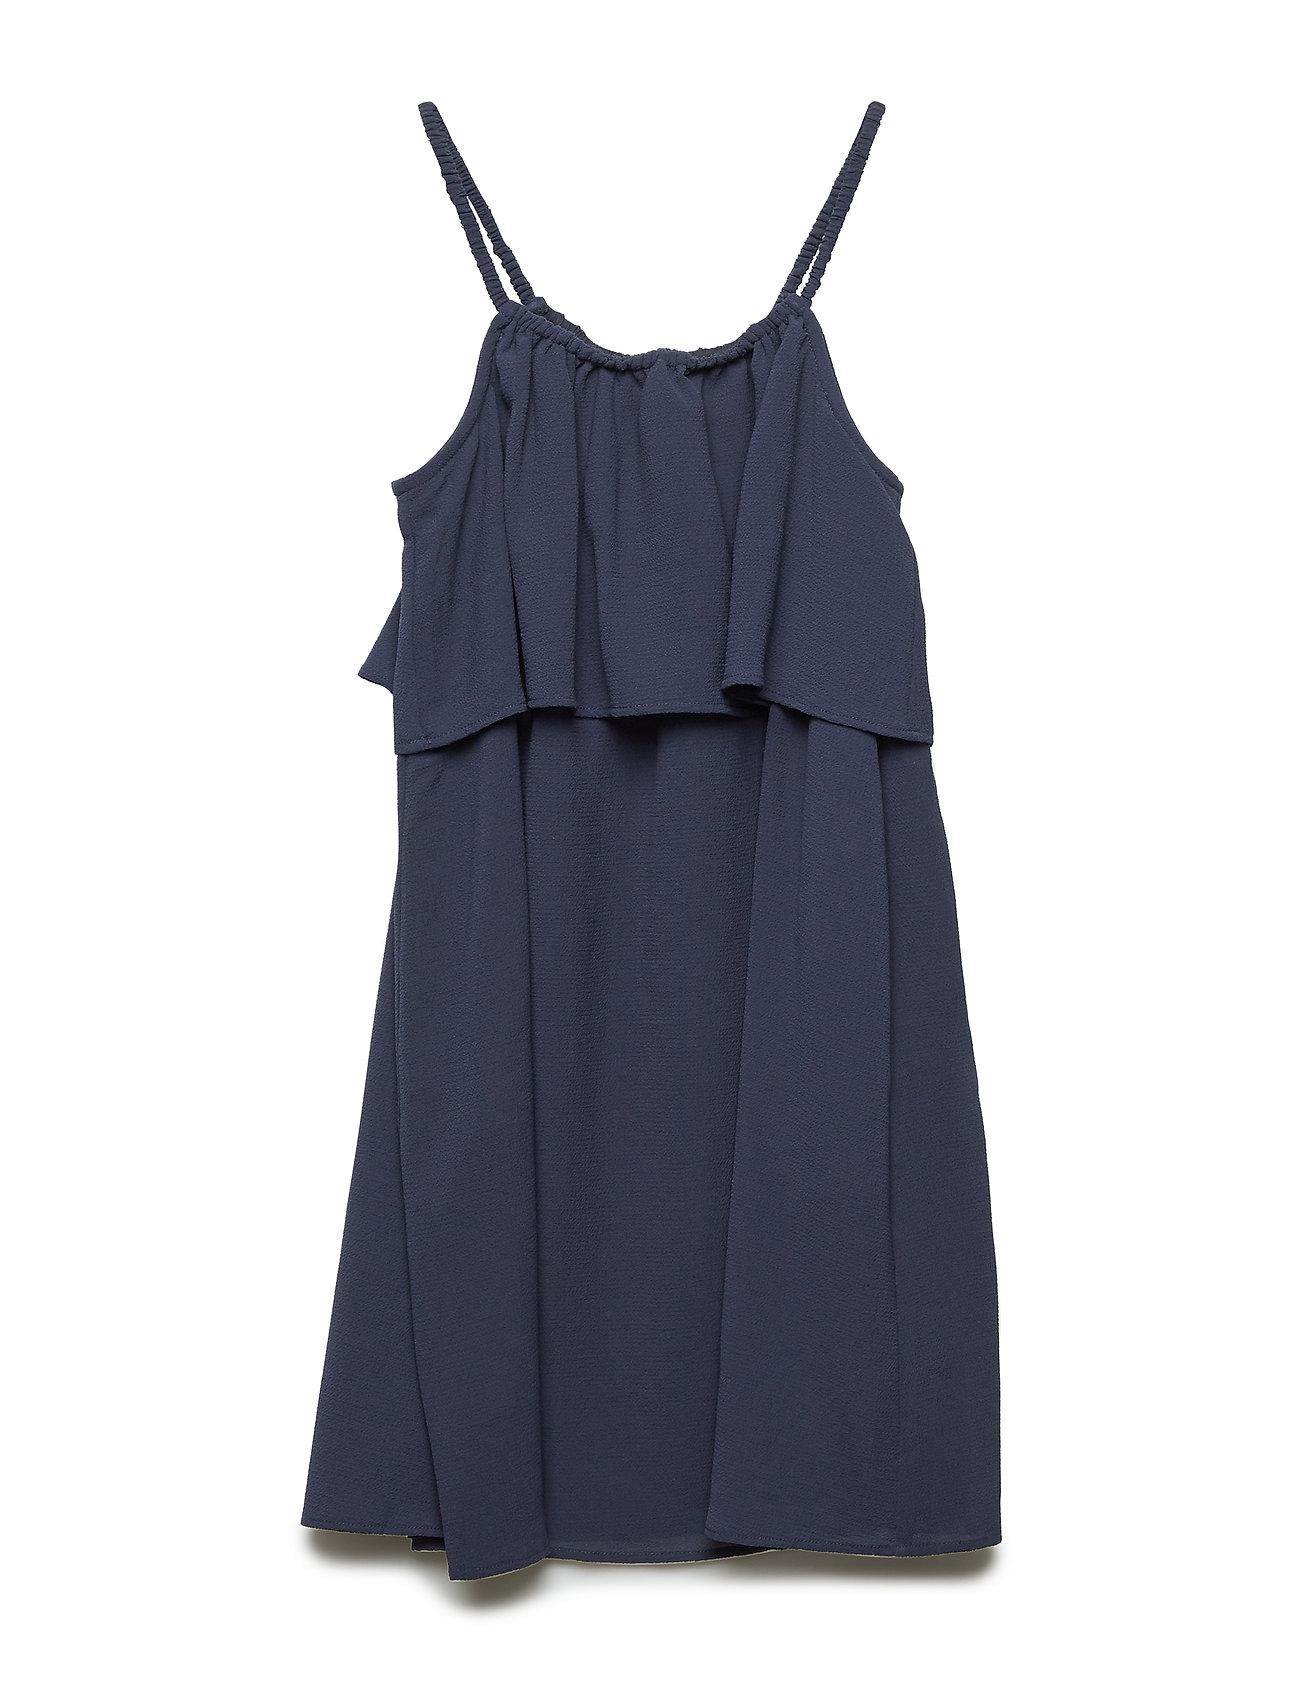 ff27927e Little Remix kjoler – Lr Mirah Layer Dress til børn i Blå - Pashion.dk